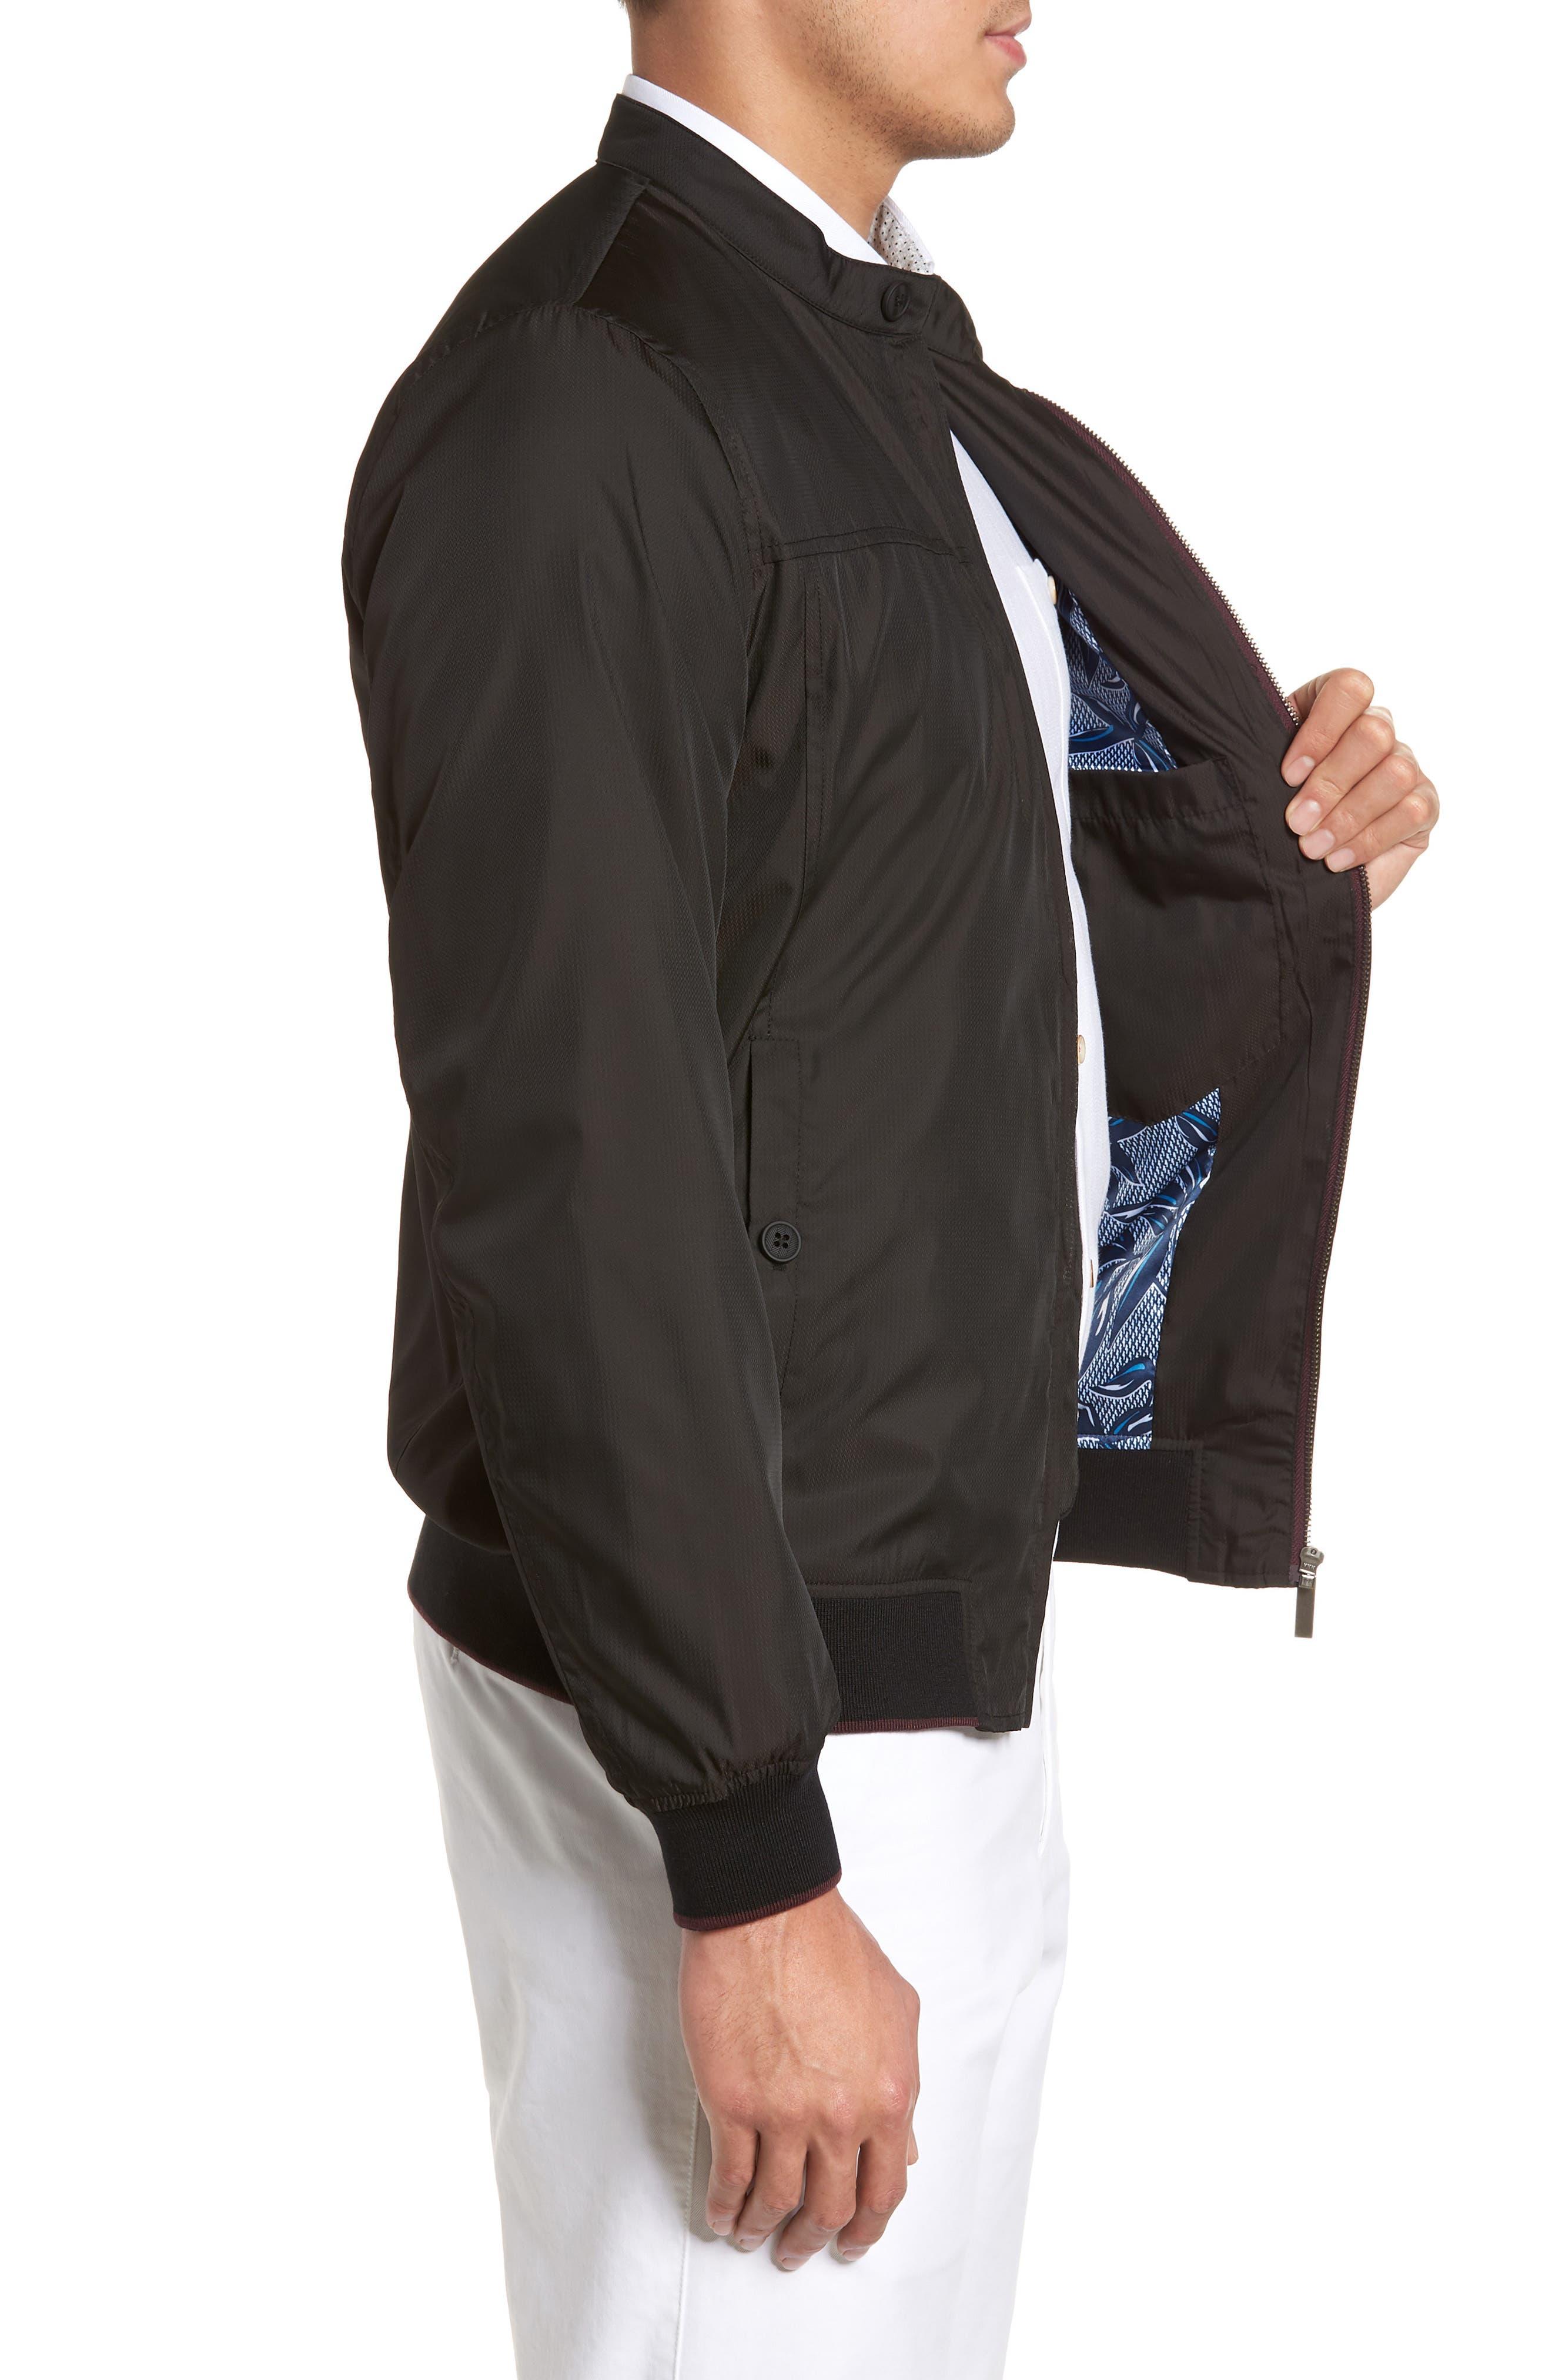 Calgar Nylon Bomber Jacket,                             Alternate thumbnail 3, color,                             Black